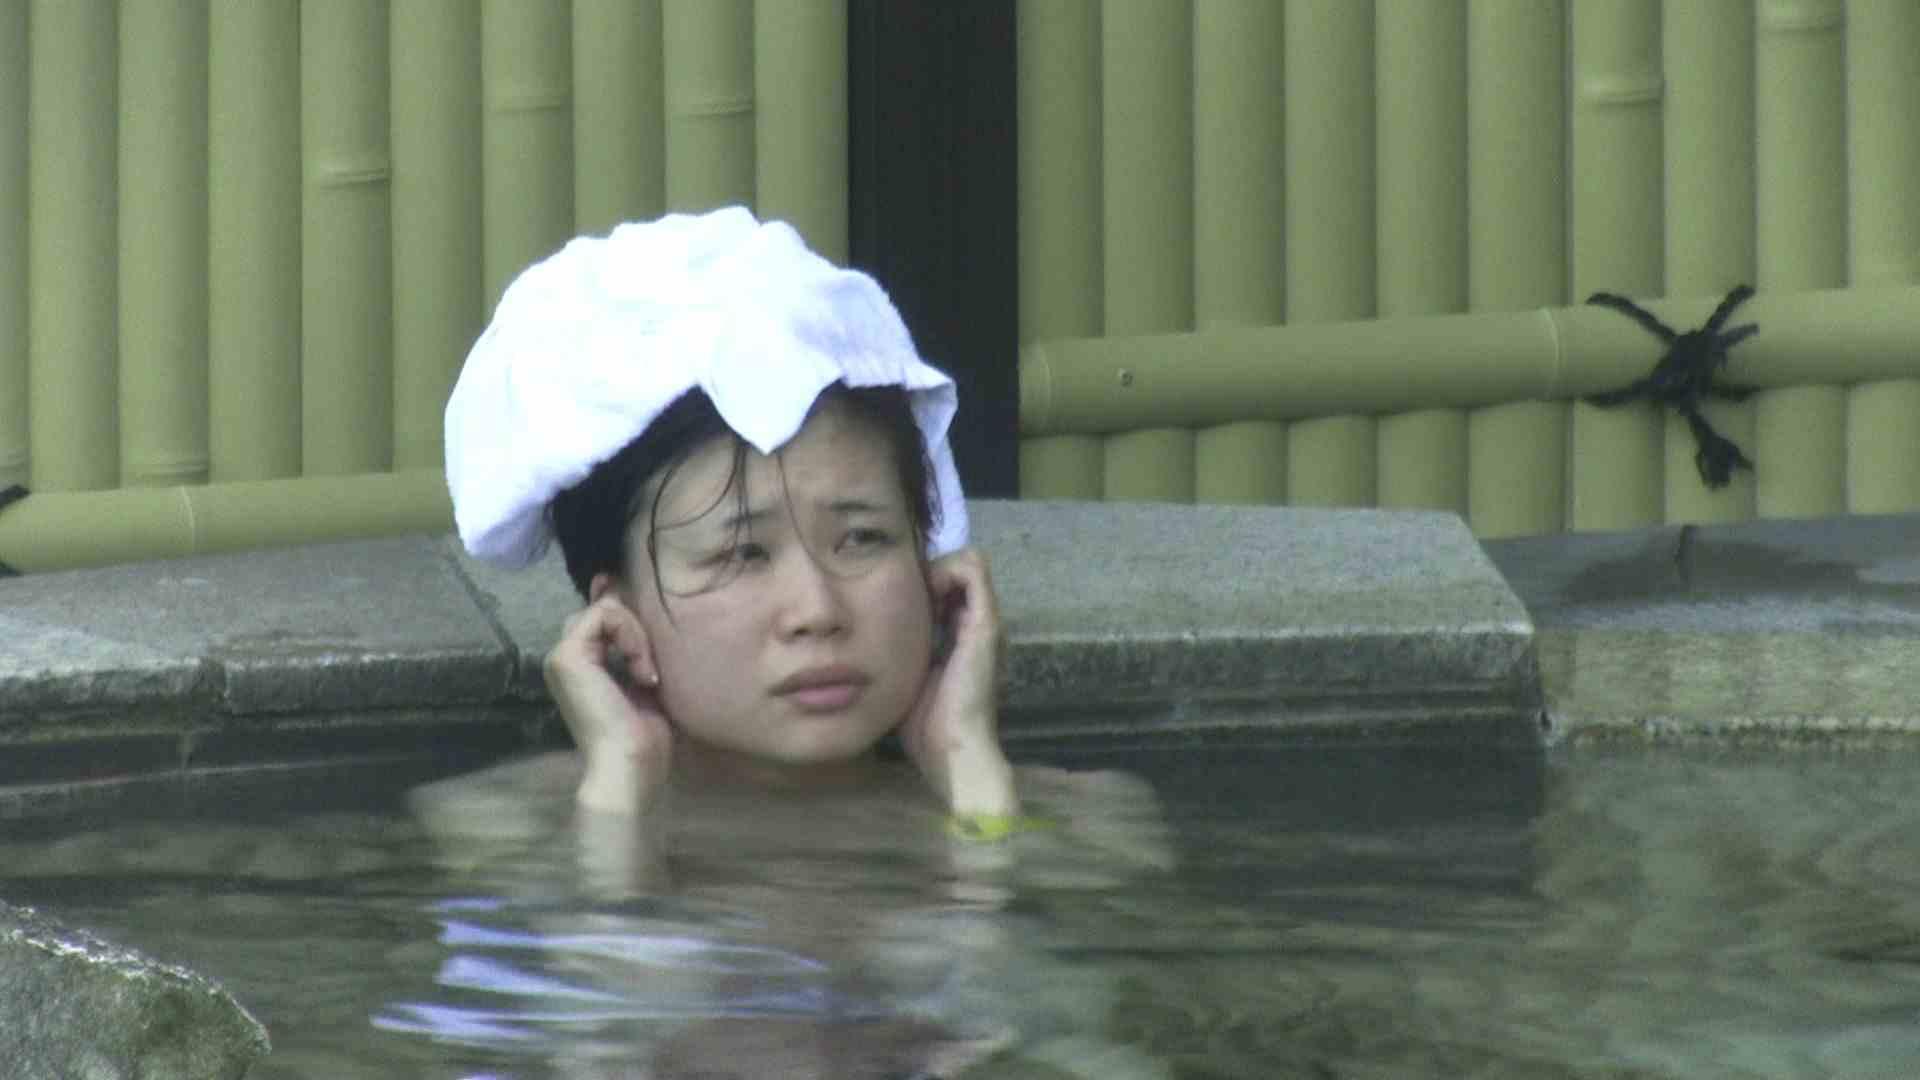 Aquaな露天風呂Vol.183 露天風呂編  104PIX 68